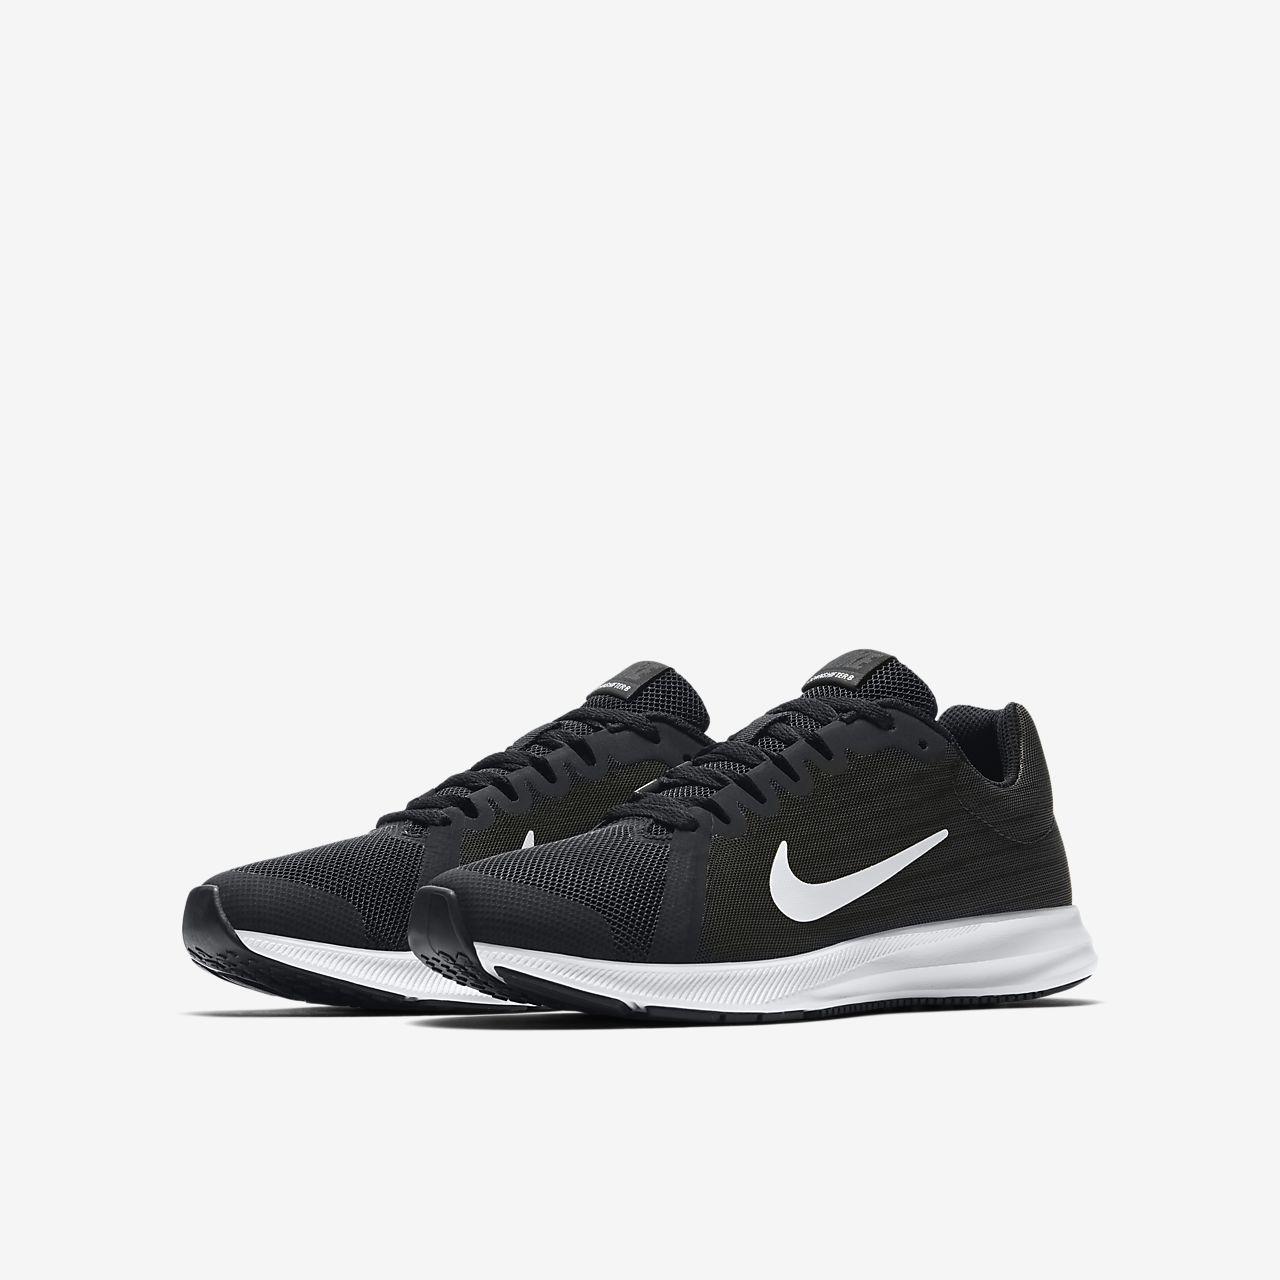 Herrenschuhe Nike Downshifter 6 Herrenschuhe Sneaker Gr Kleidung & Accessoires 45 ZuverläSsige Leistung